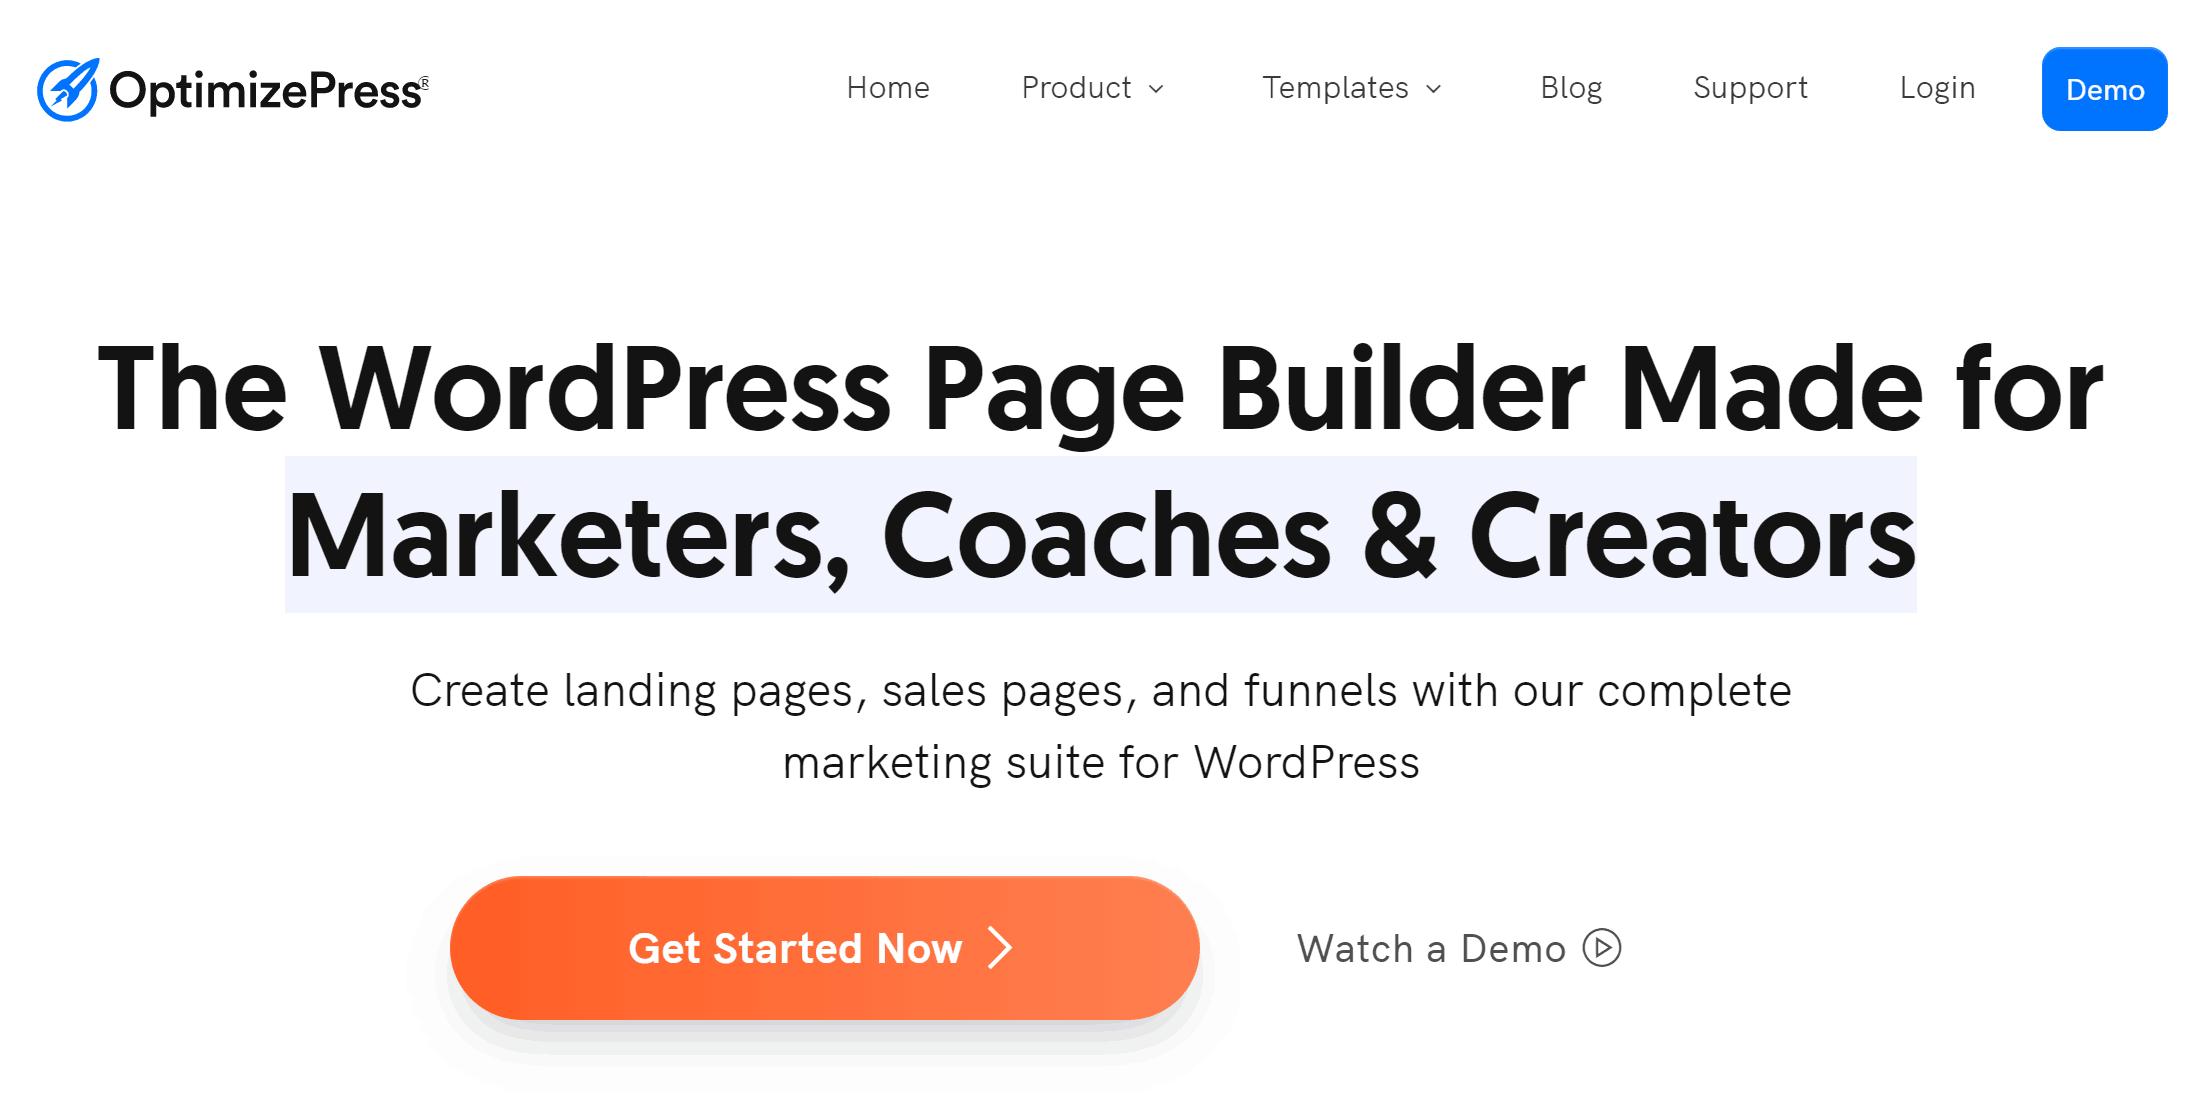 OptimizePress Home Page